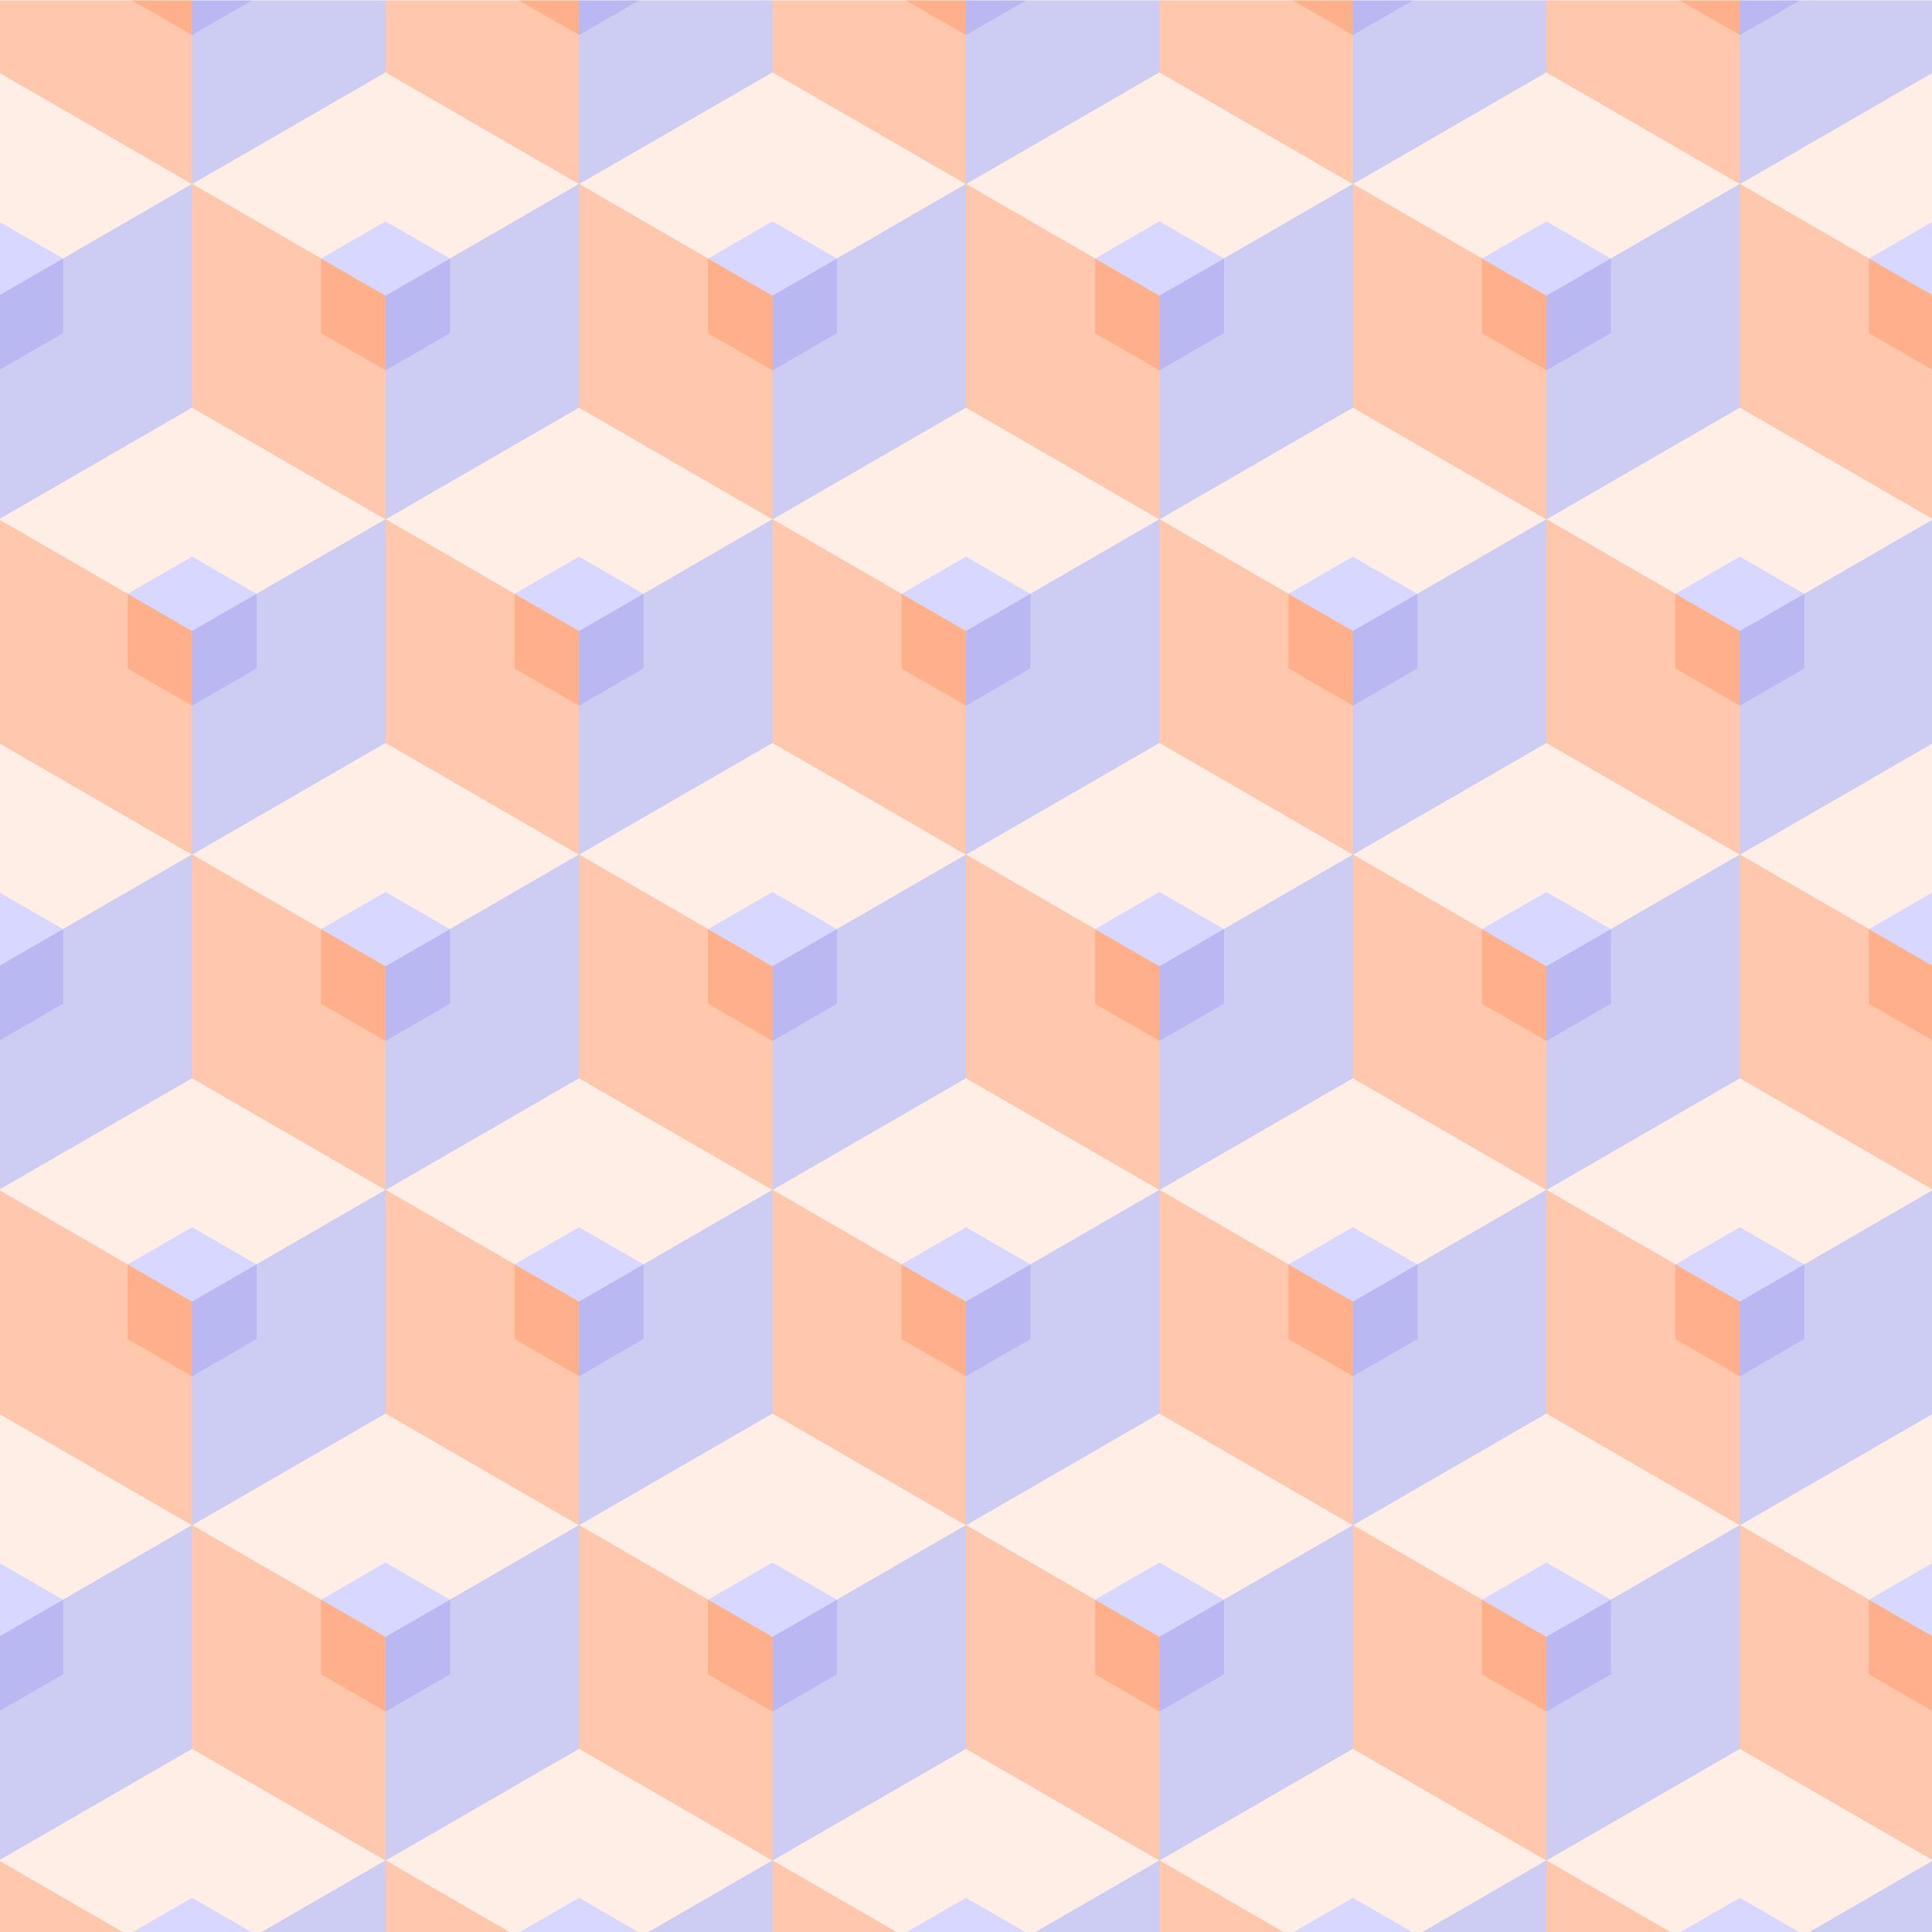 Seamless 3D Pastel Cube Pattern